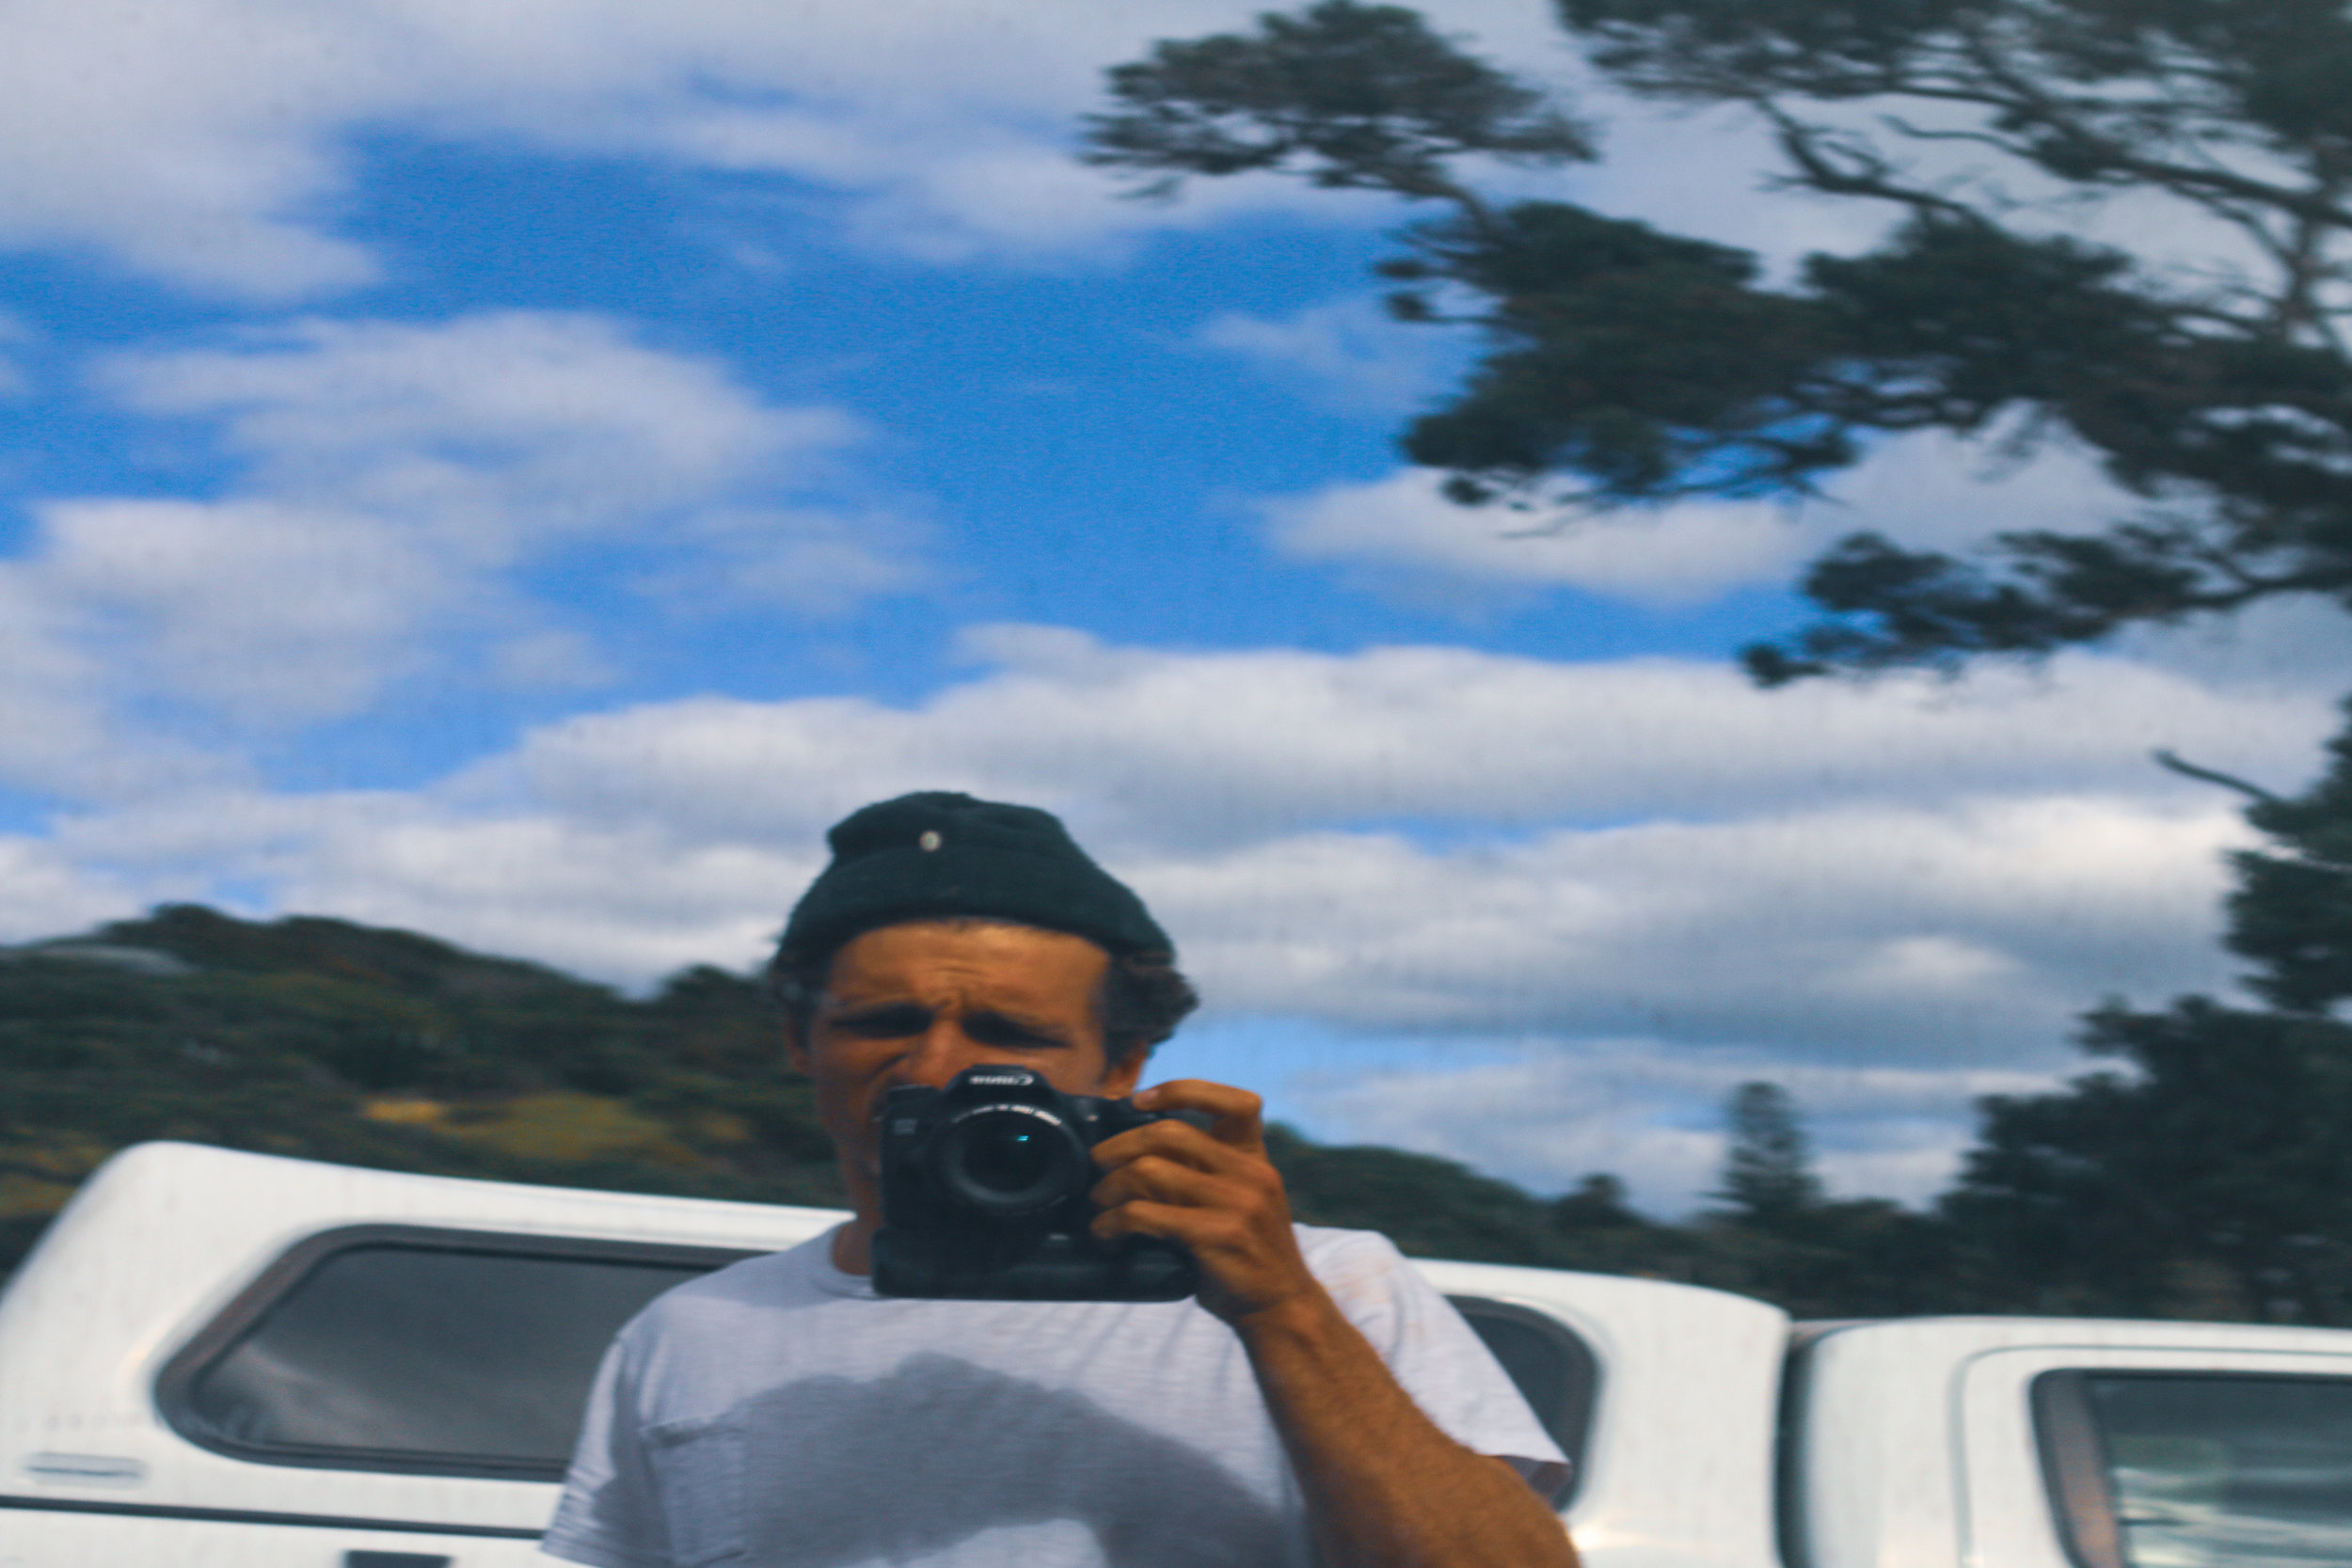 Mark behind the lens.